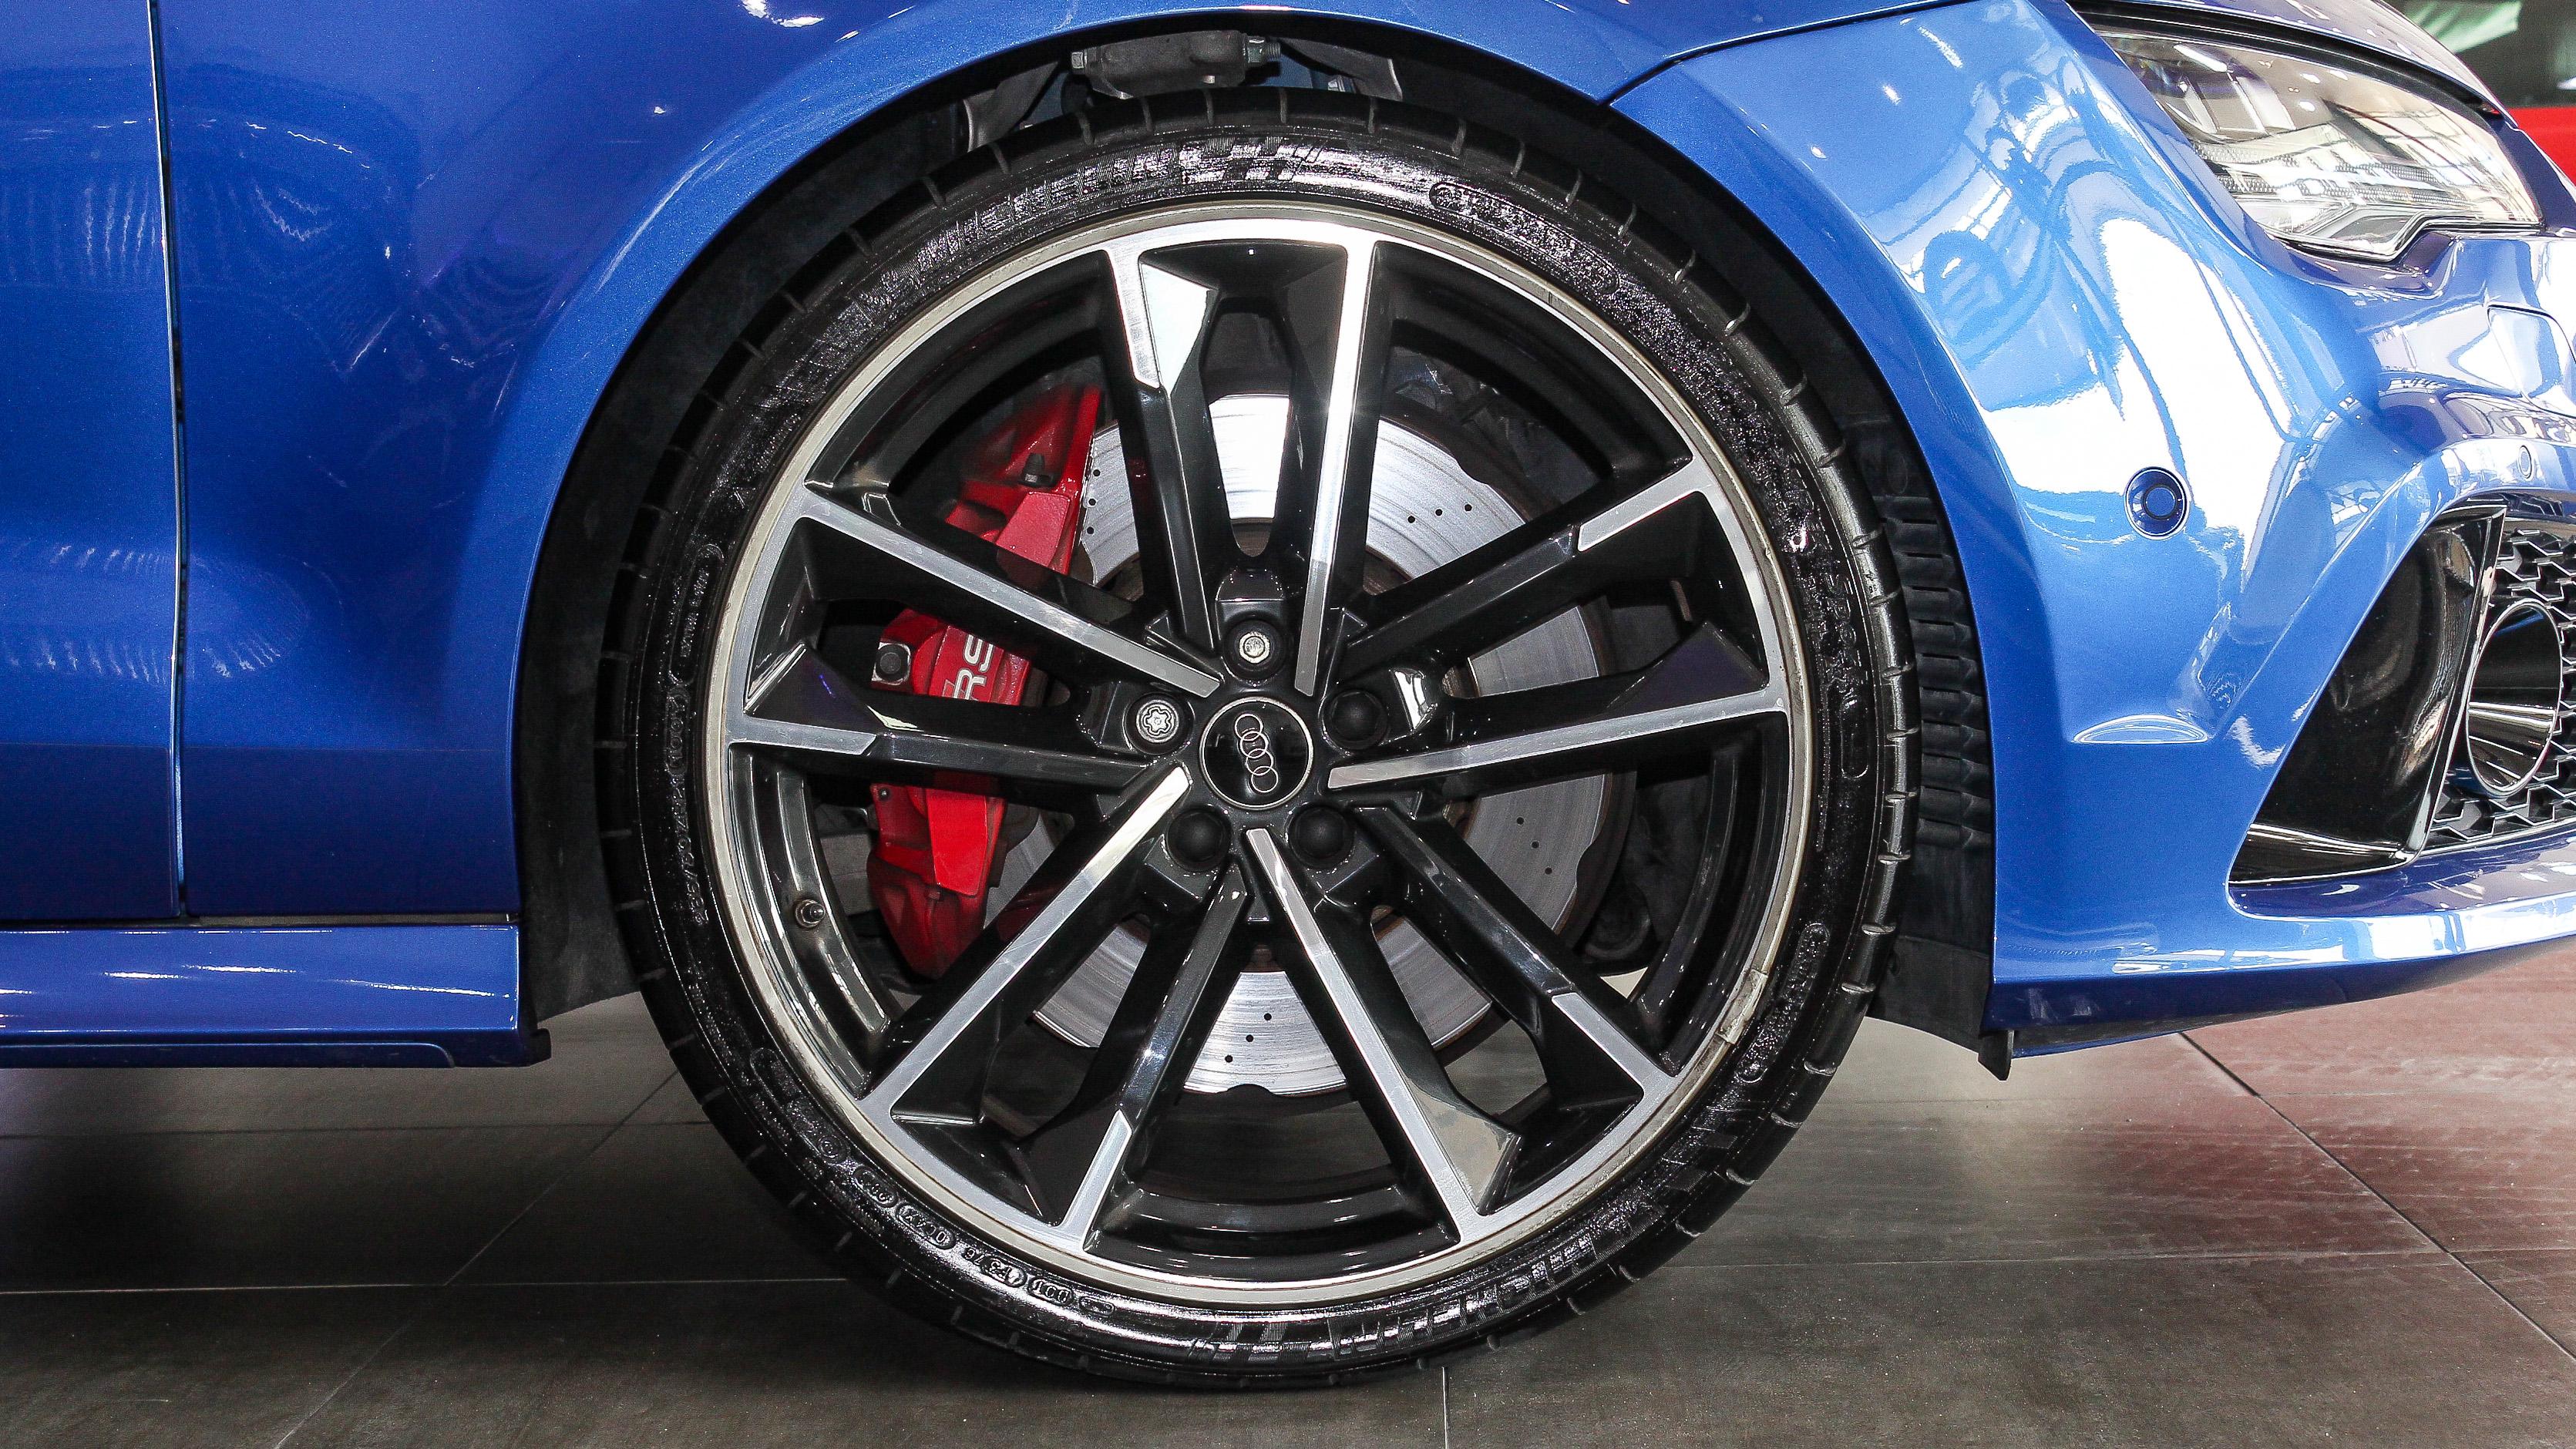 2016-Audi-RS7-Blue-Black-GCC-10.jpg